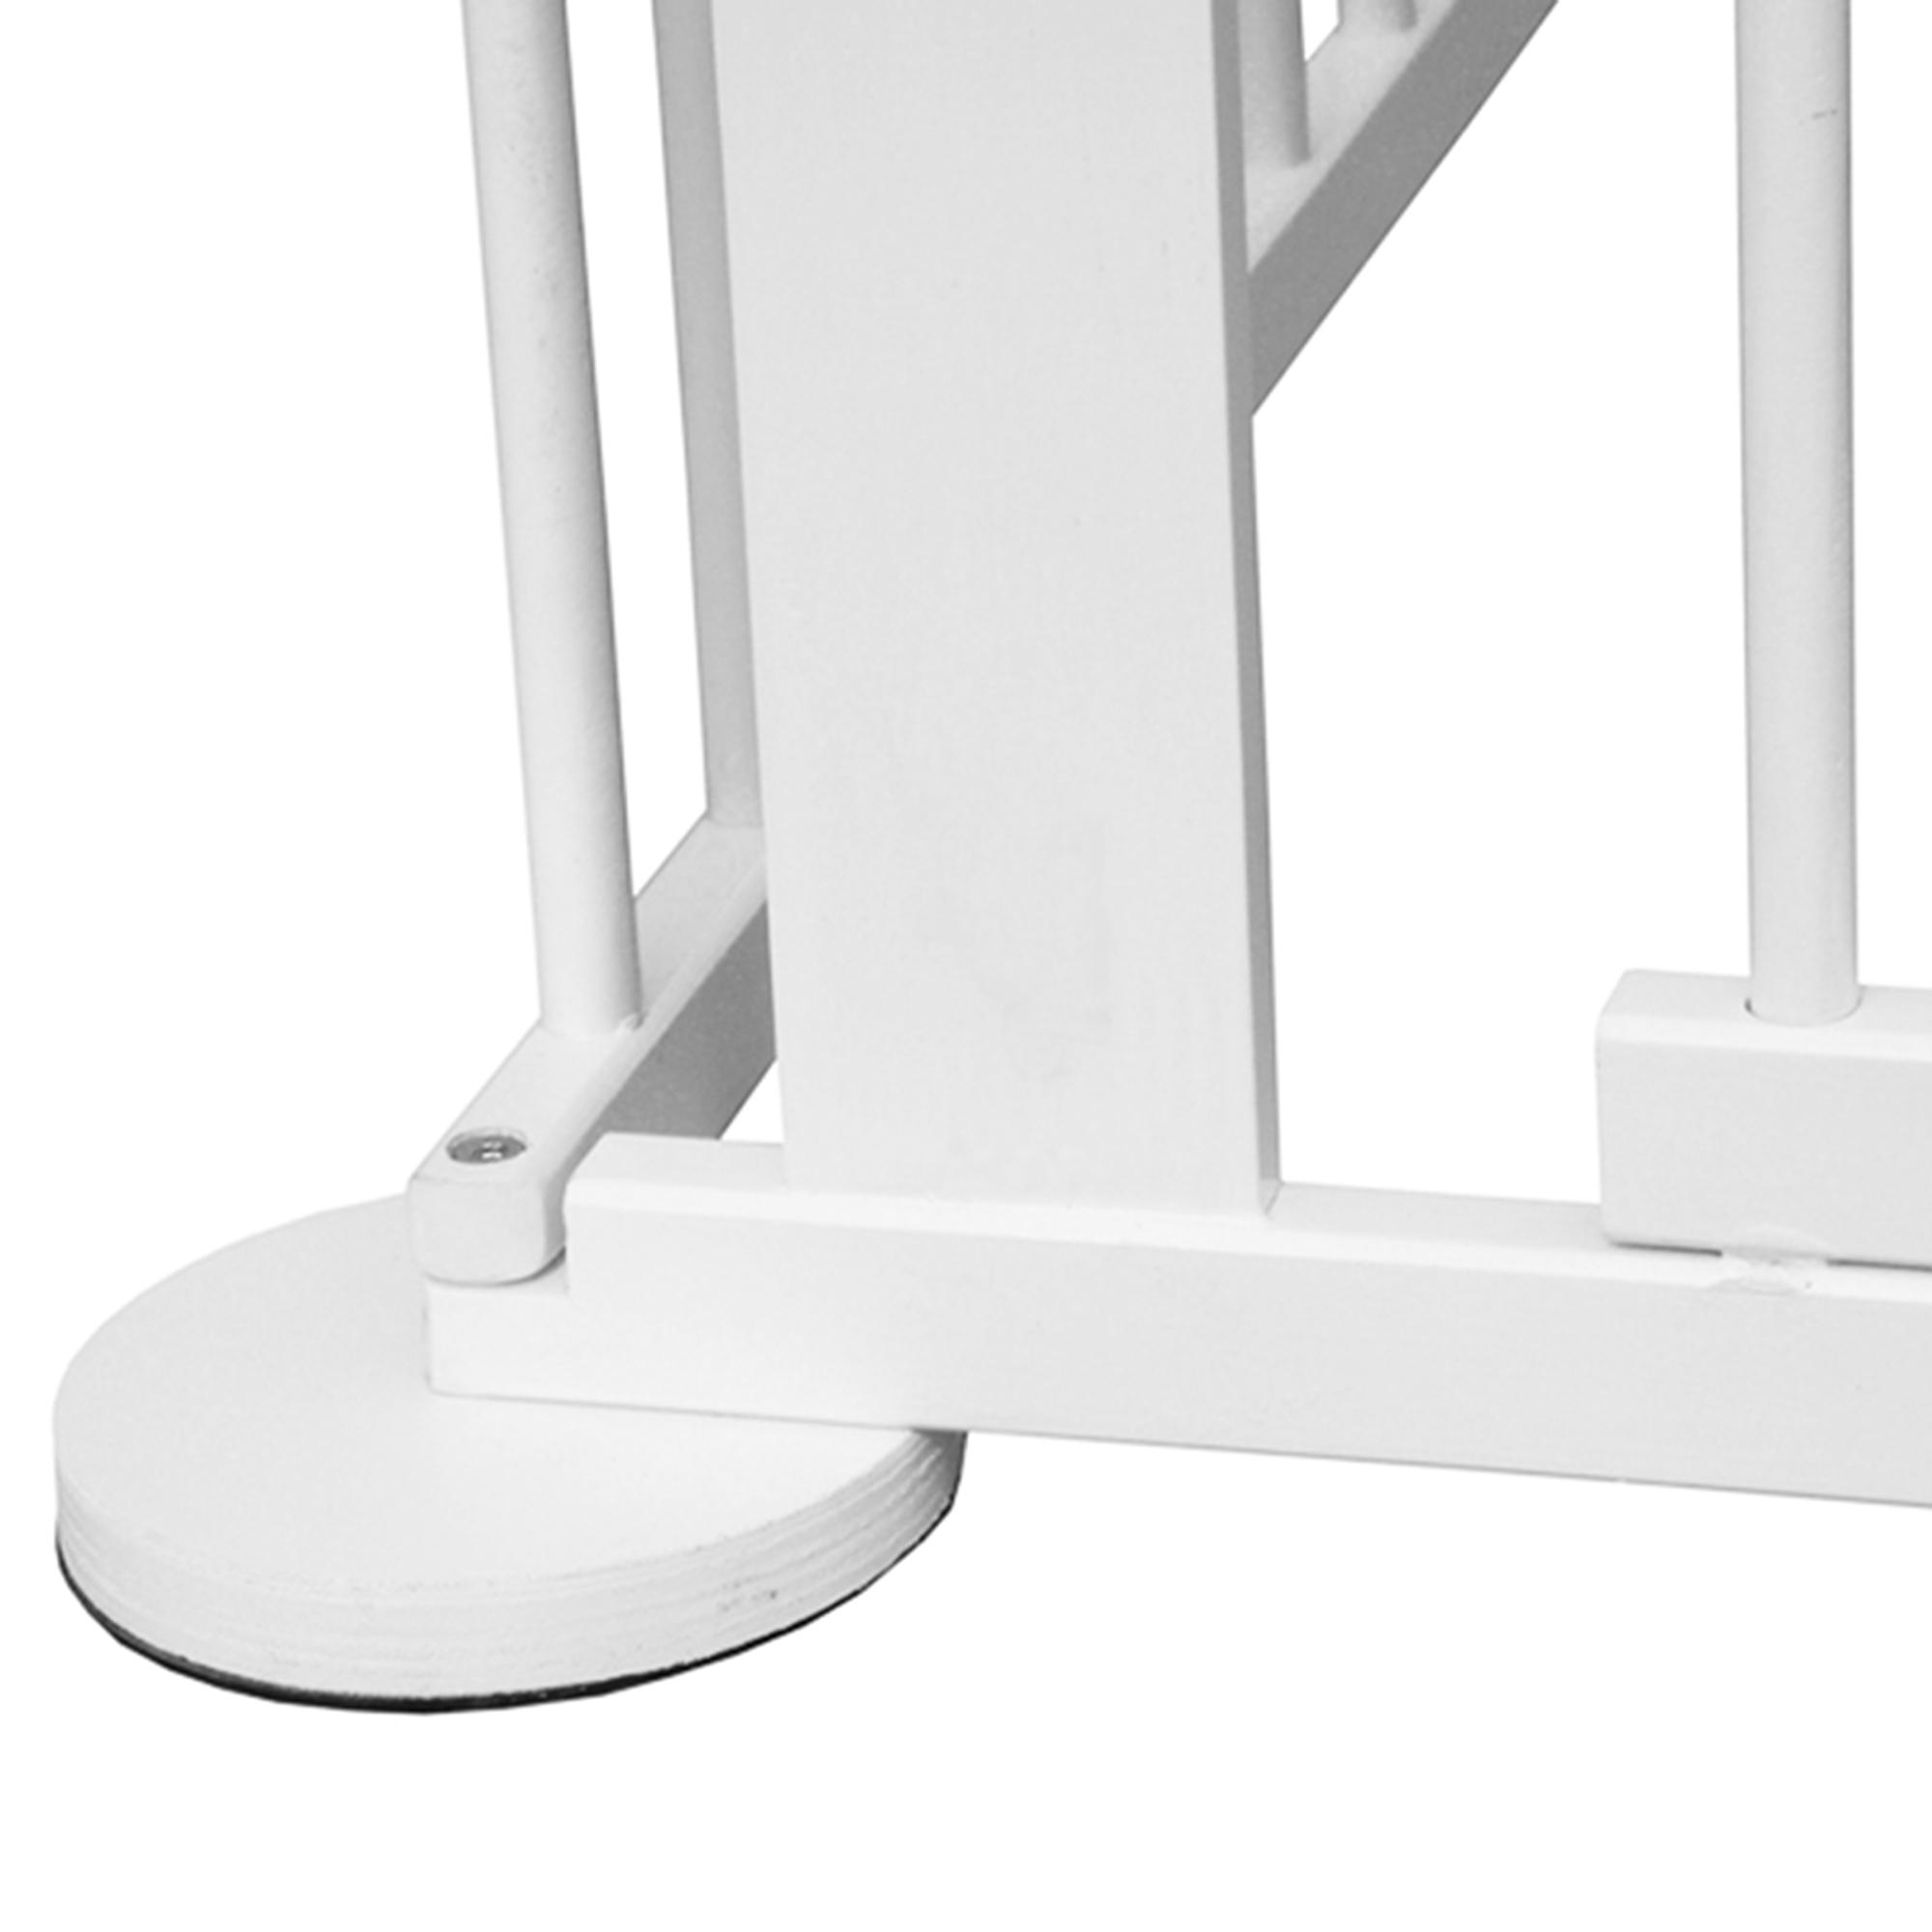 kiduku laufstall wei absperrgitter kaminschutzgitter laufgitter 7 2 m mit t r ebay. Black Bedroom Furniture Sets. Home Design Ideas